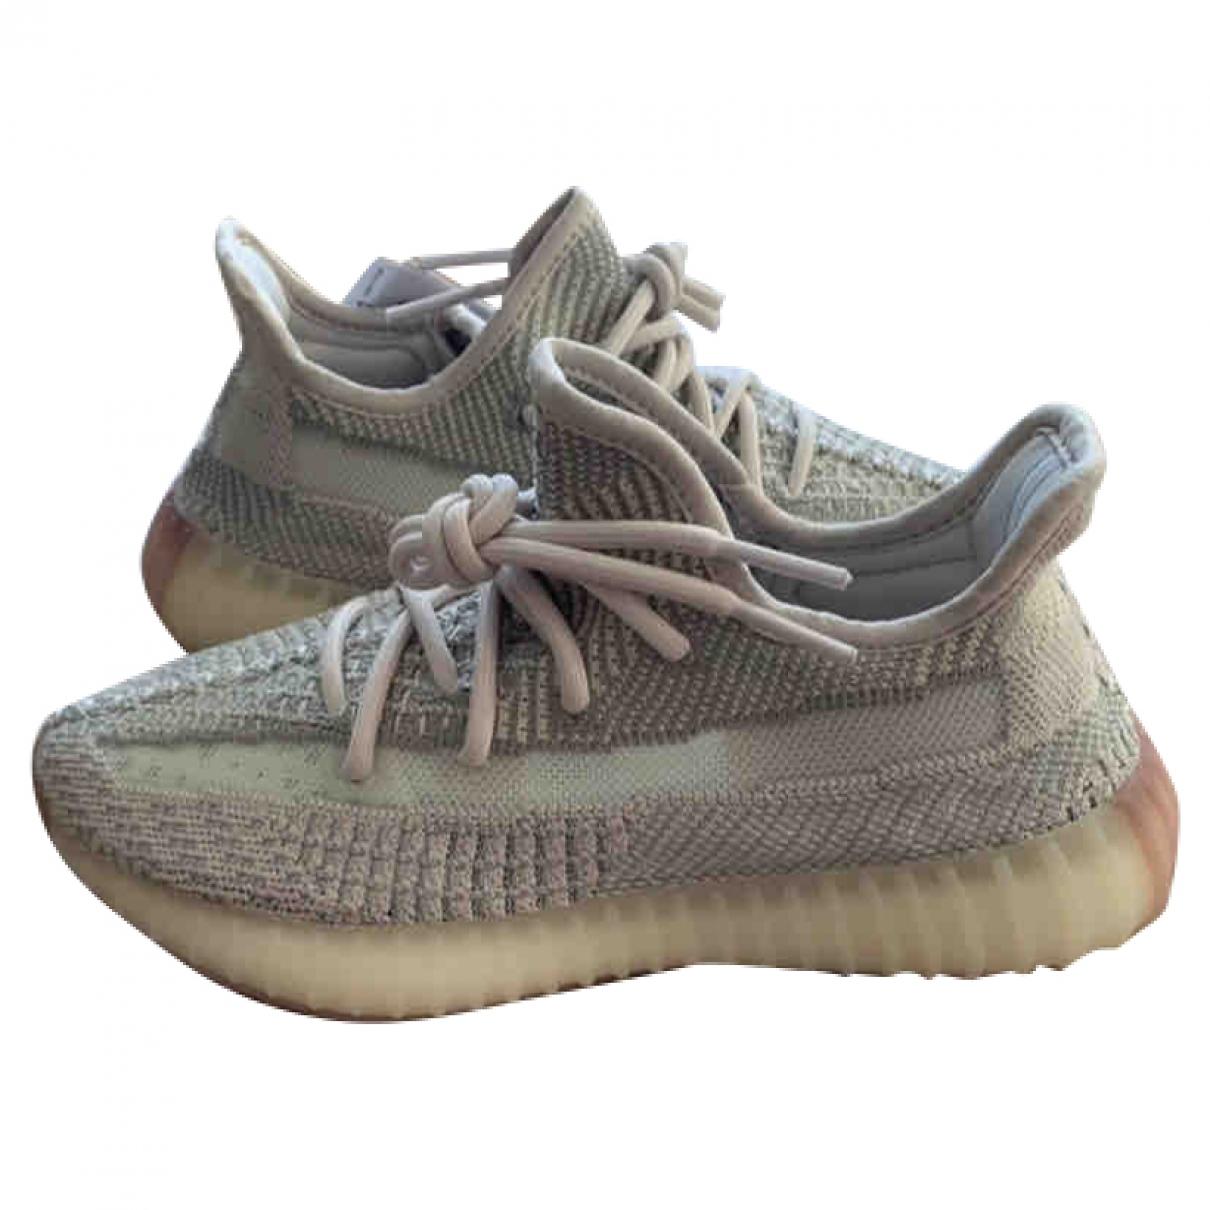 Yeezy X Adidas - Baskets Boost 350 V2 pour femme en toile - beige